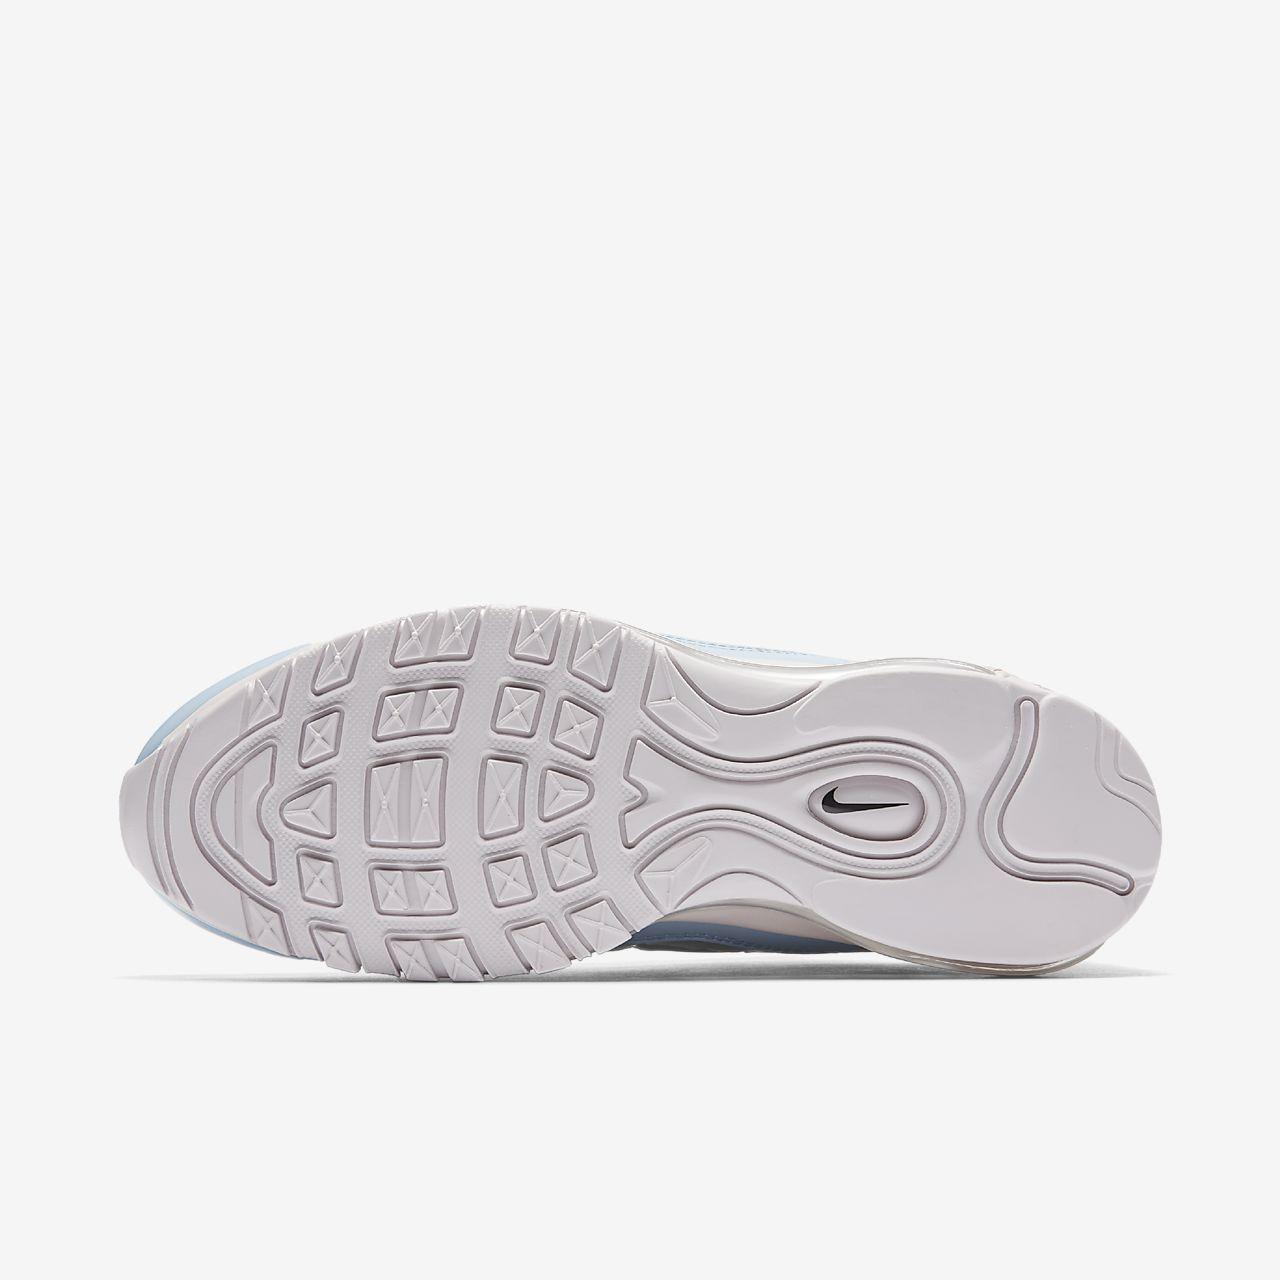 6ad5ab565eba Chaussure Homme Air Max Nike Plus Ma 97 Pour wnHBOwzq